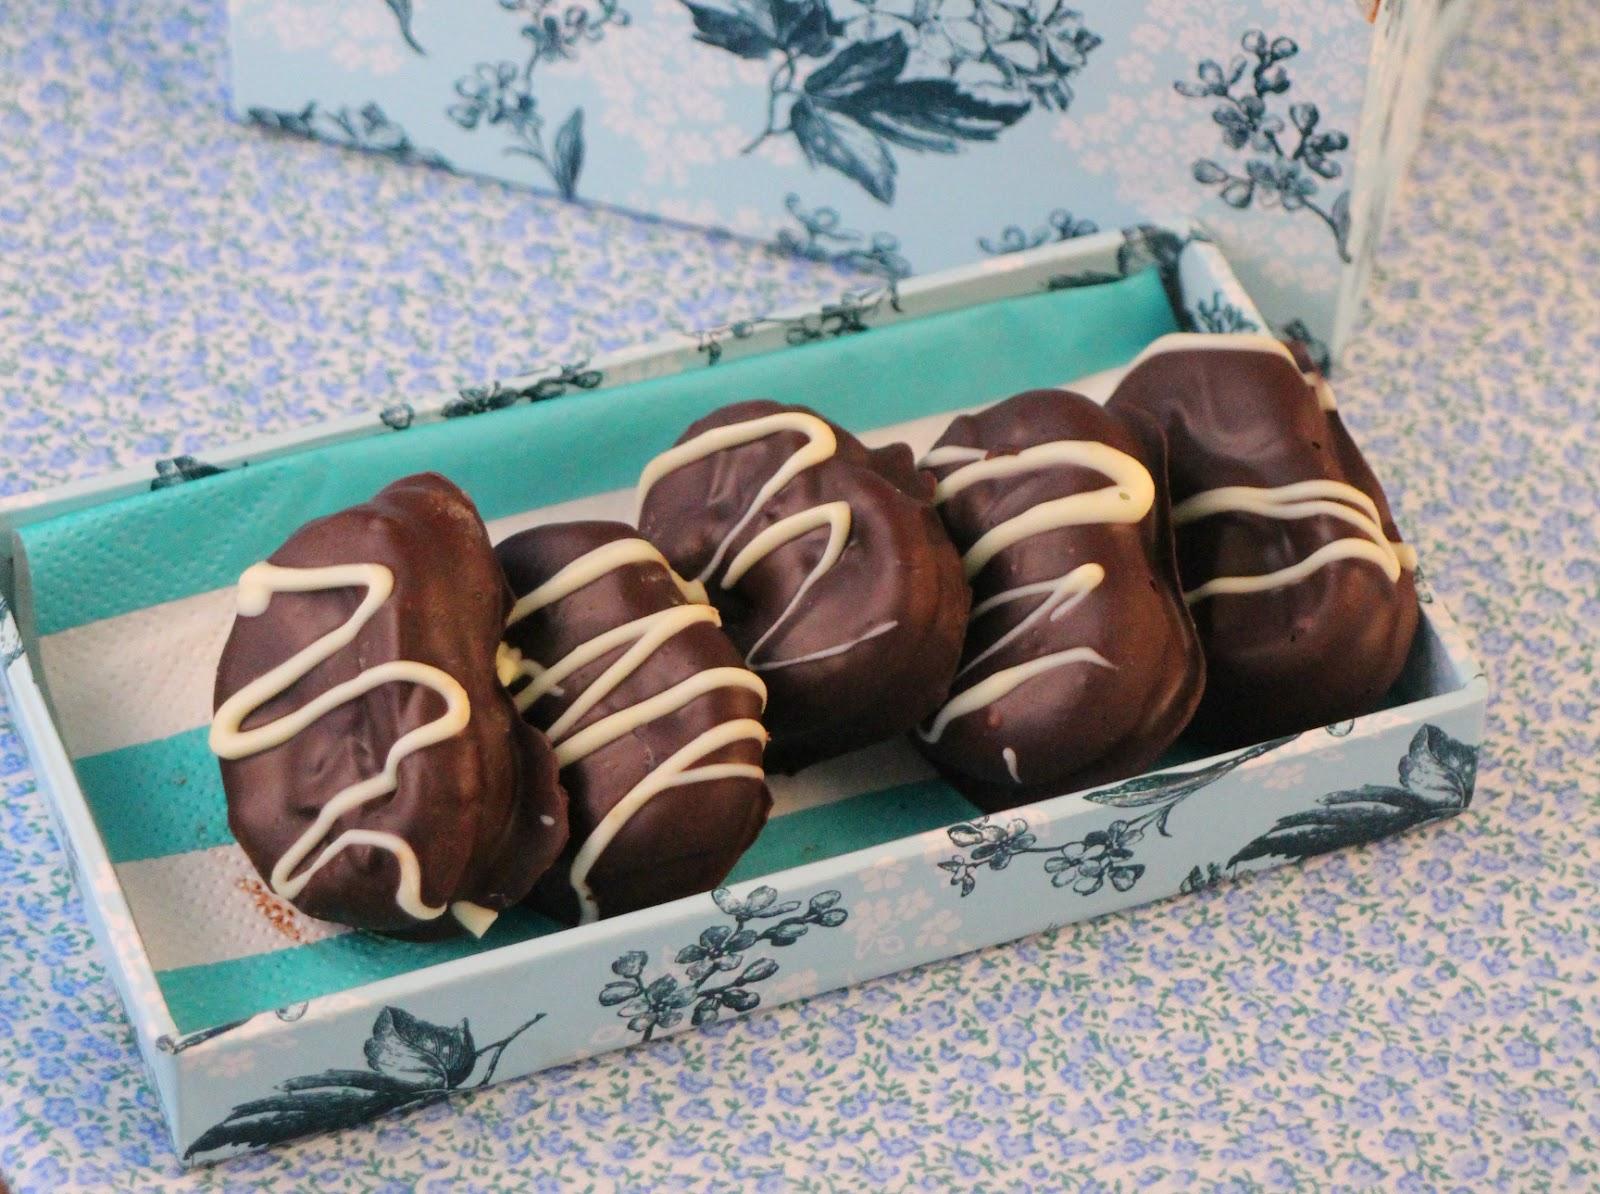 golosinas-de-dulce-de-leche, pretzel-con-chocolate